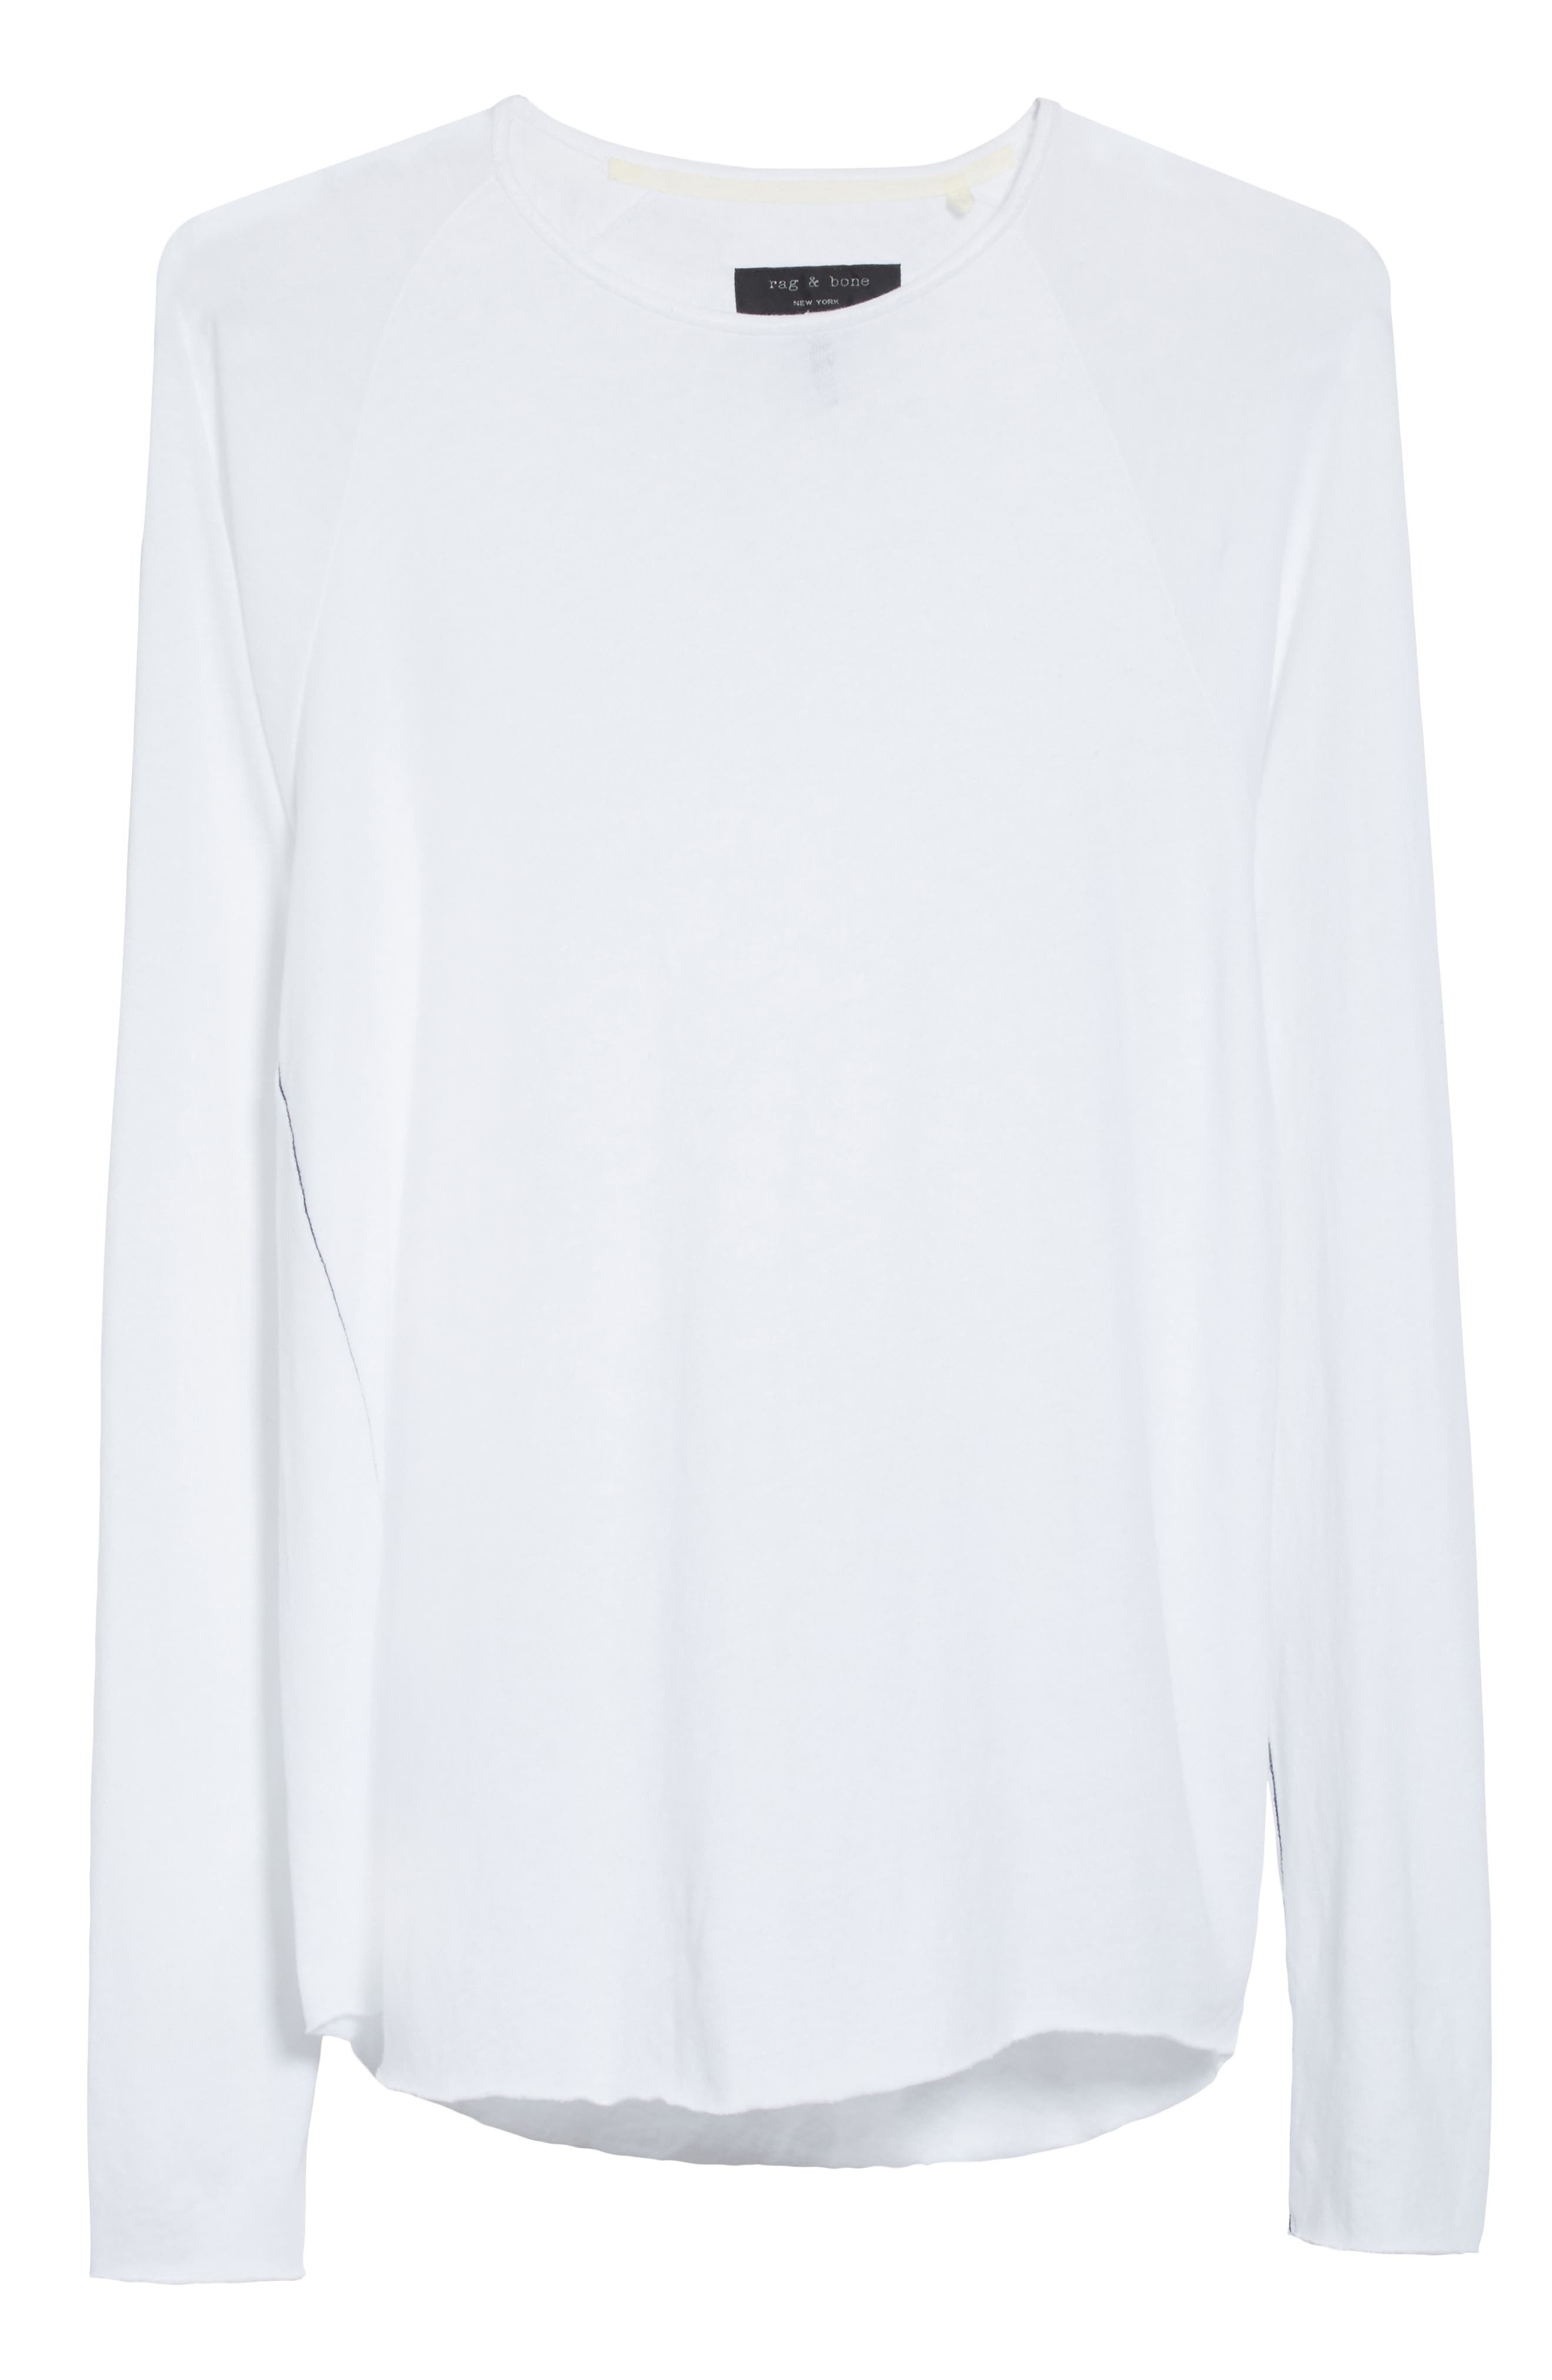 Rupert Long Sleeve T-Shirt,                             Alternate thumbnail 6, color,                             100